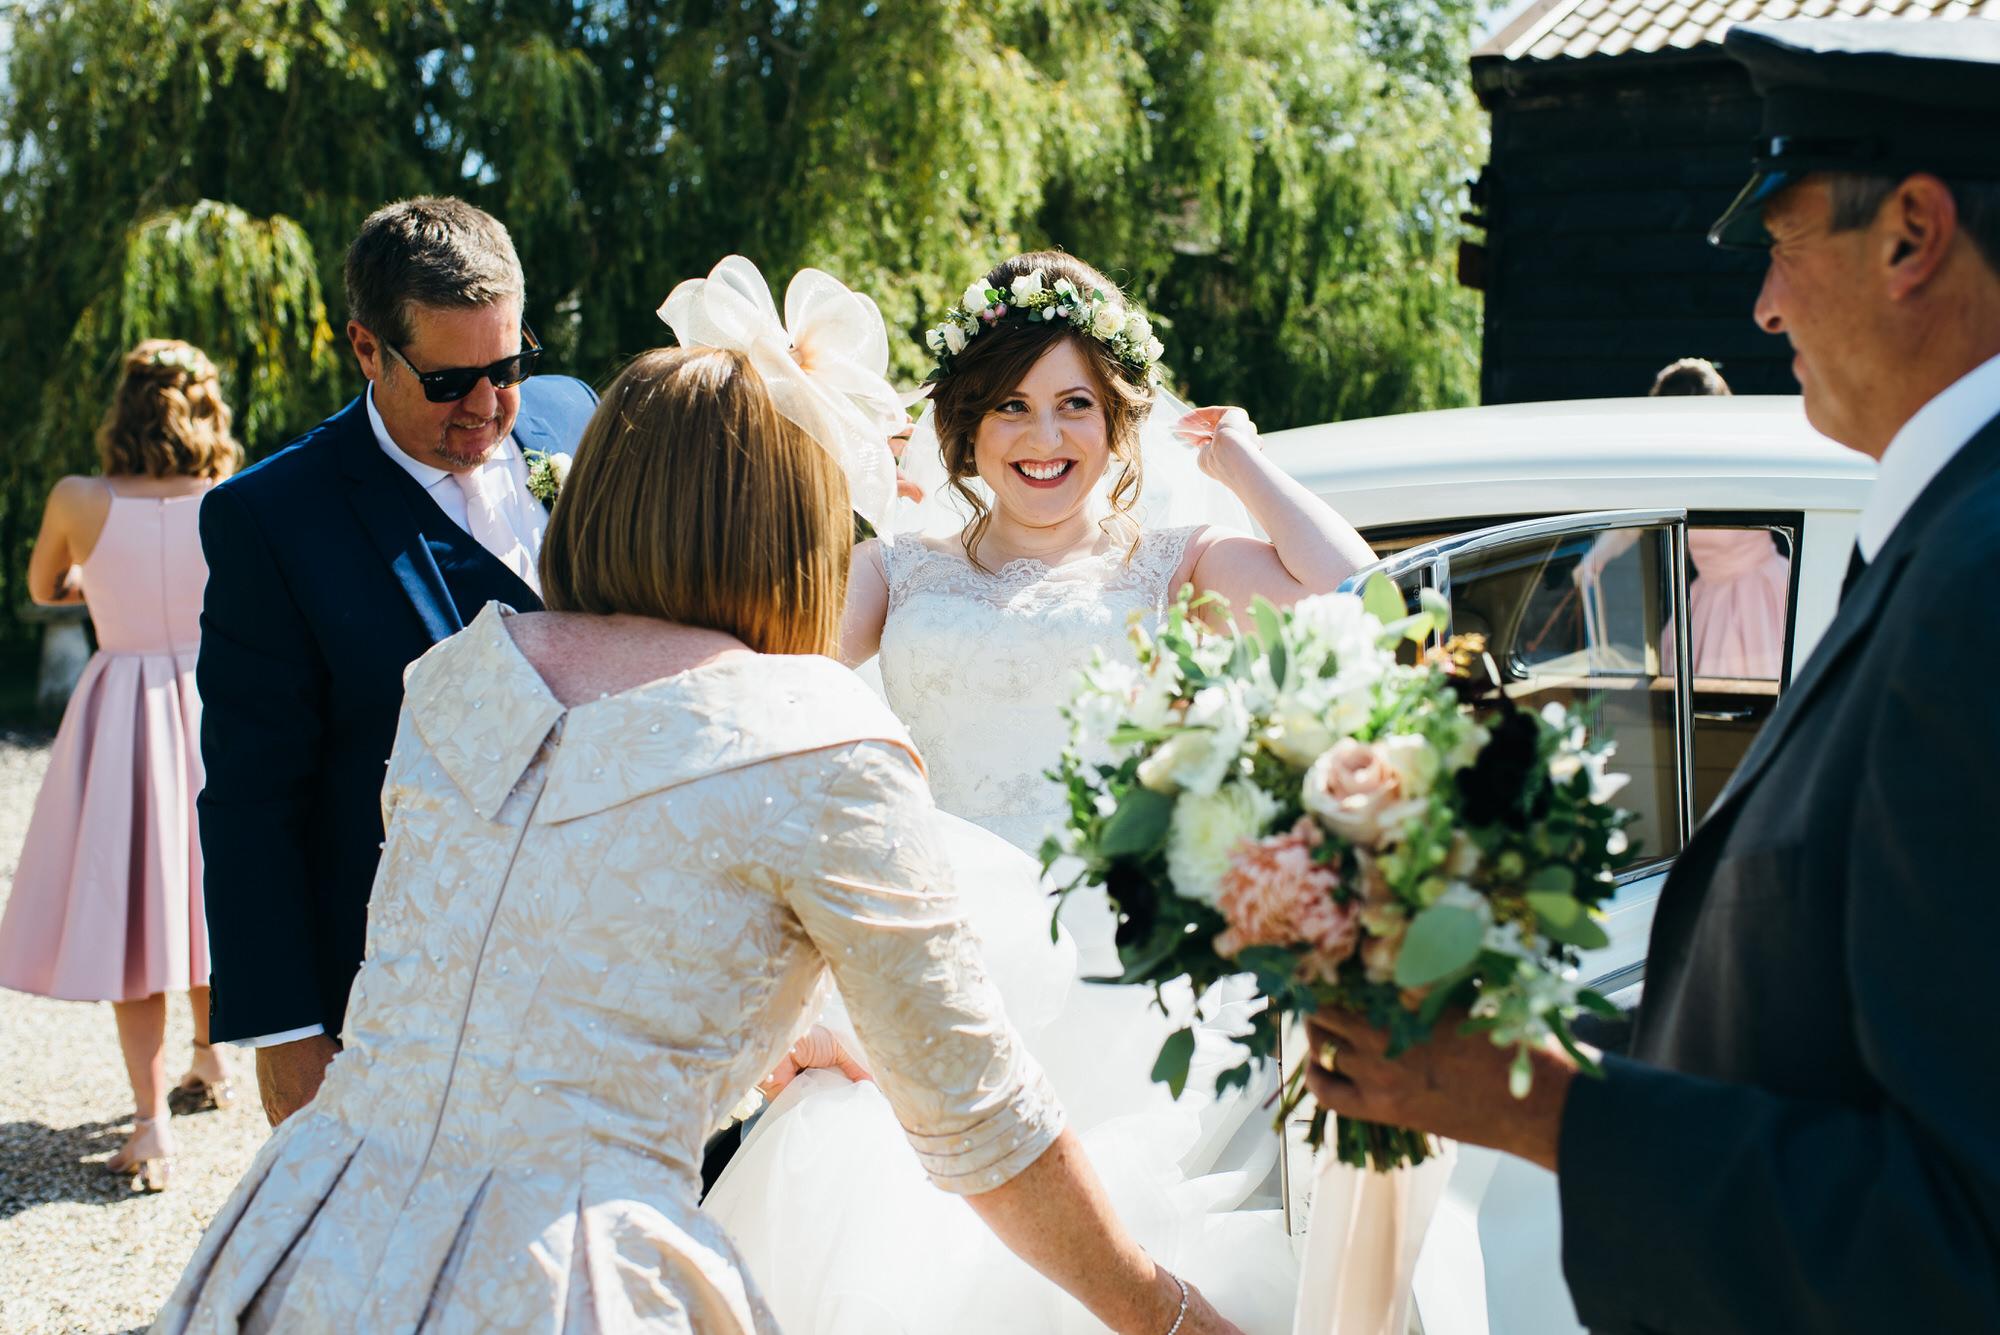 Colville hall wedding bride arrives